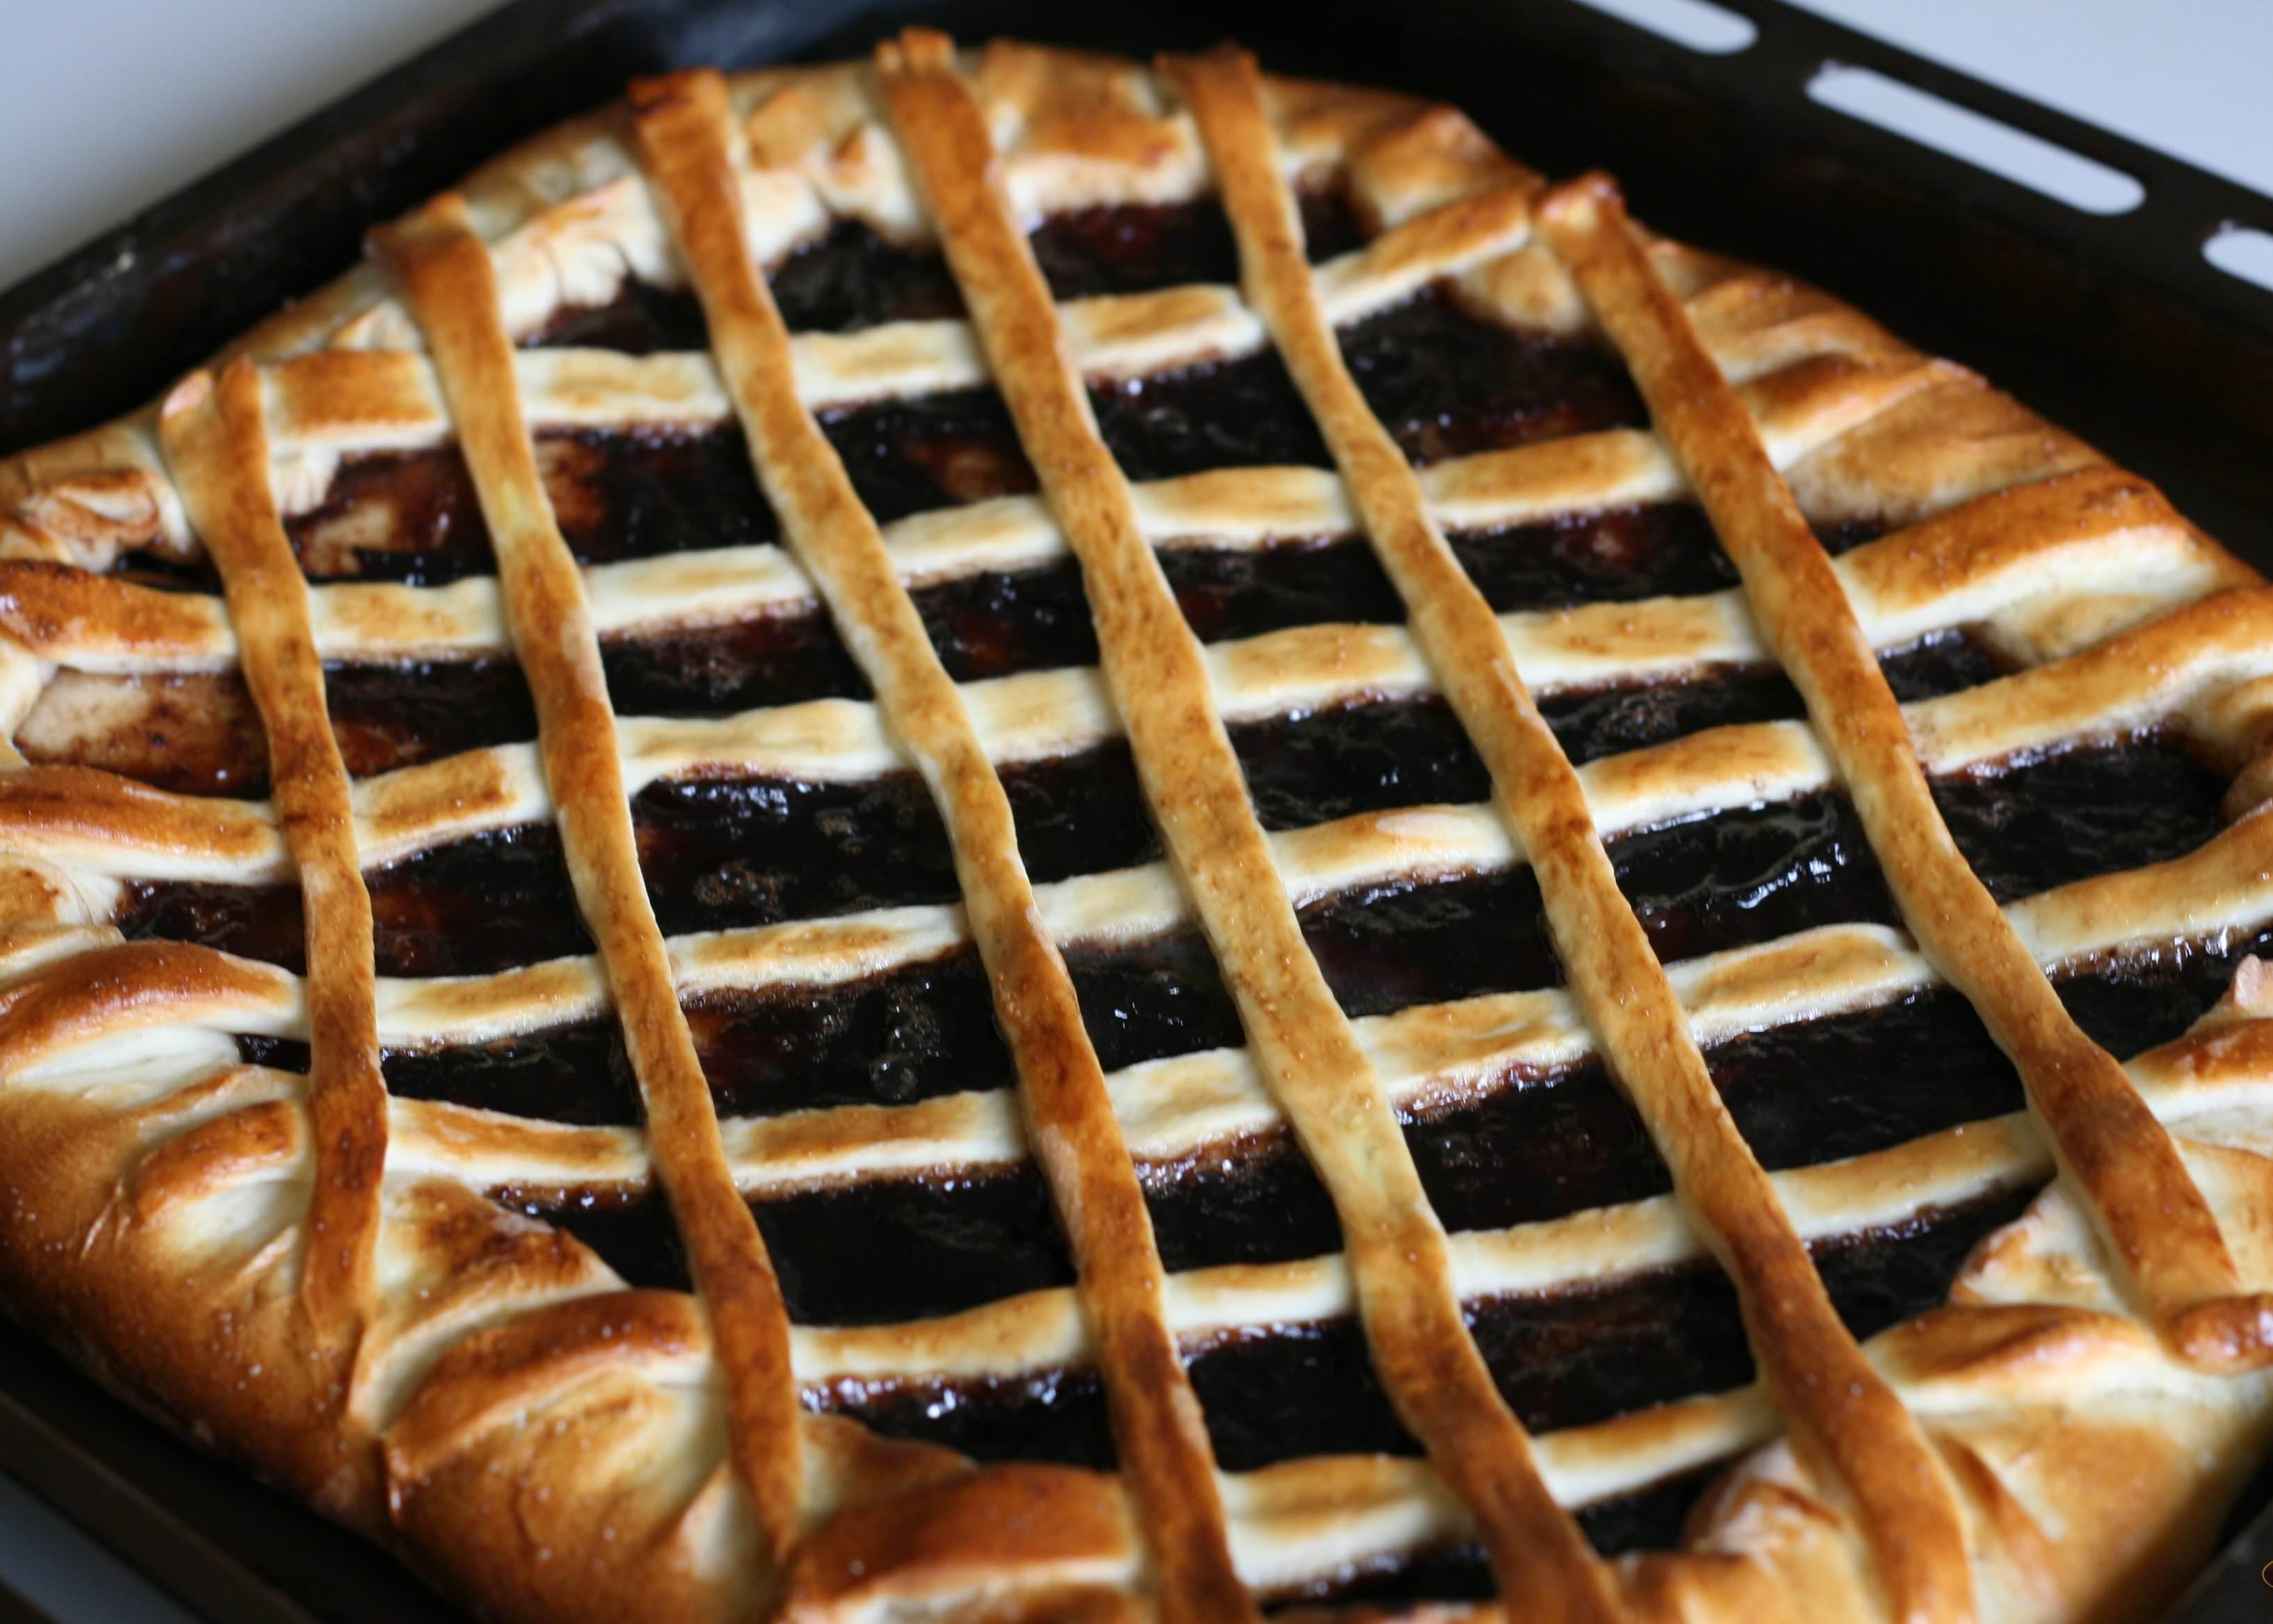 Украсить пирог можно, красиво разложив по нему тесто